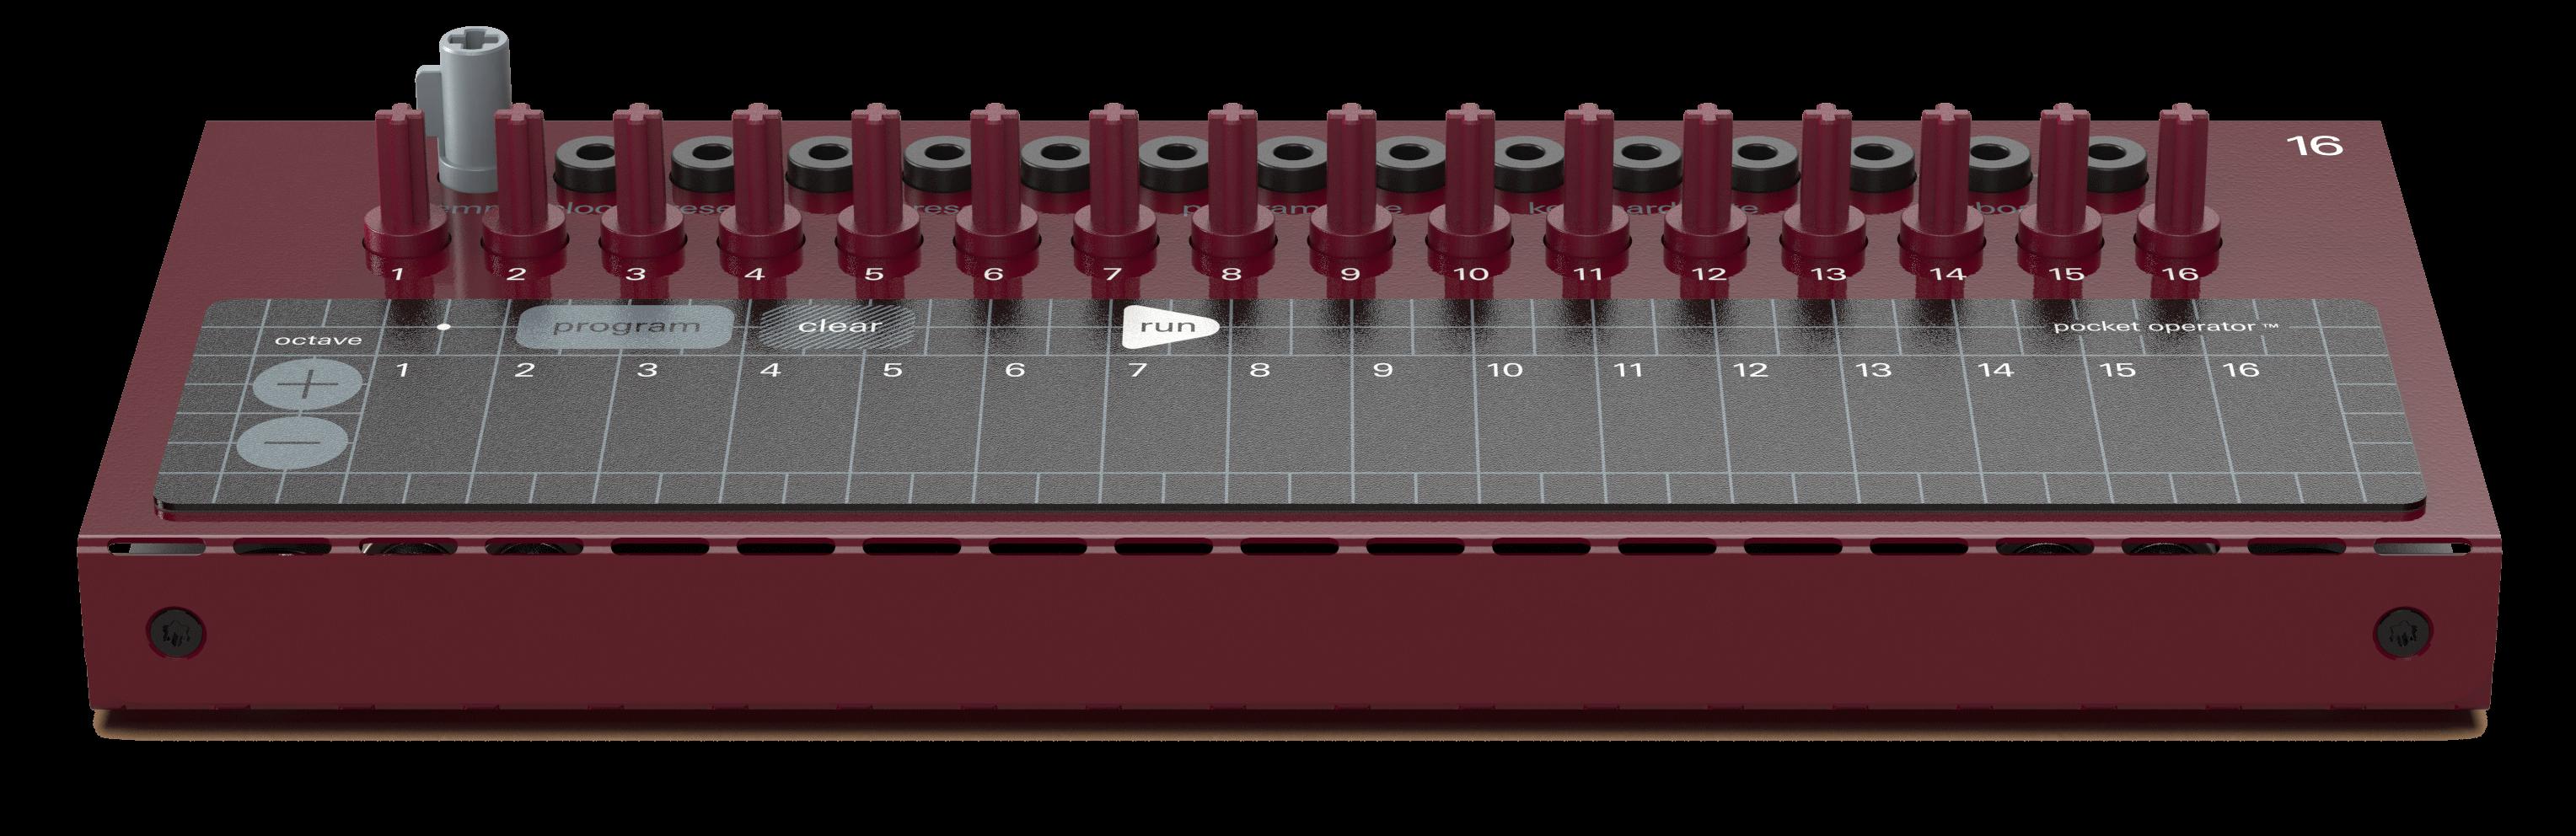 po modular 16